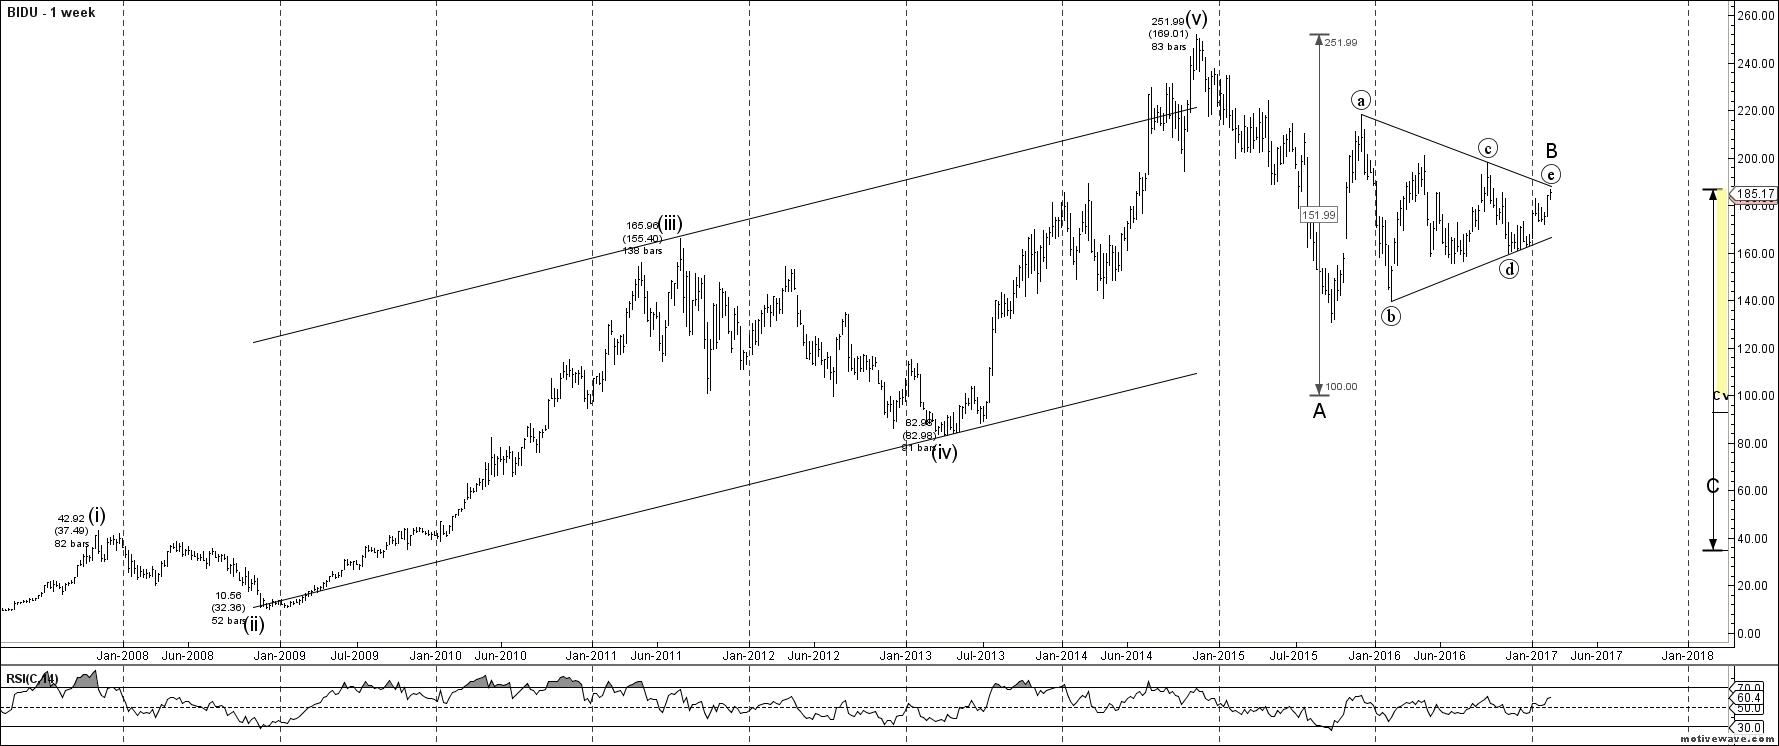 Baidu Stock Quote Baidu Inc Overvalued And Heading Lower  Baidu Incnasdaq